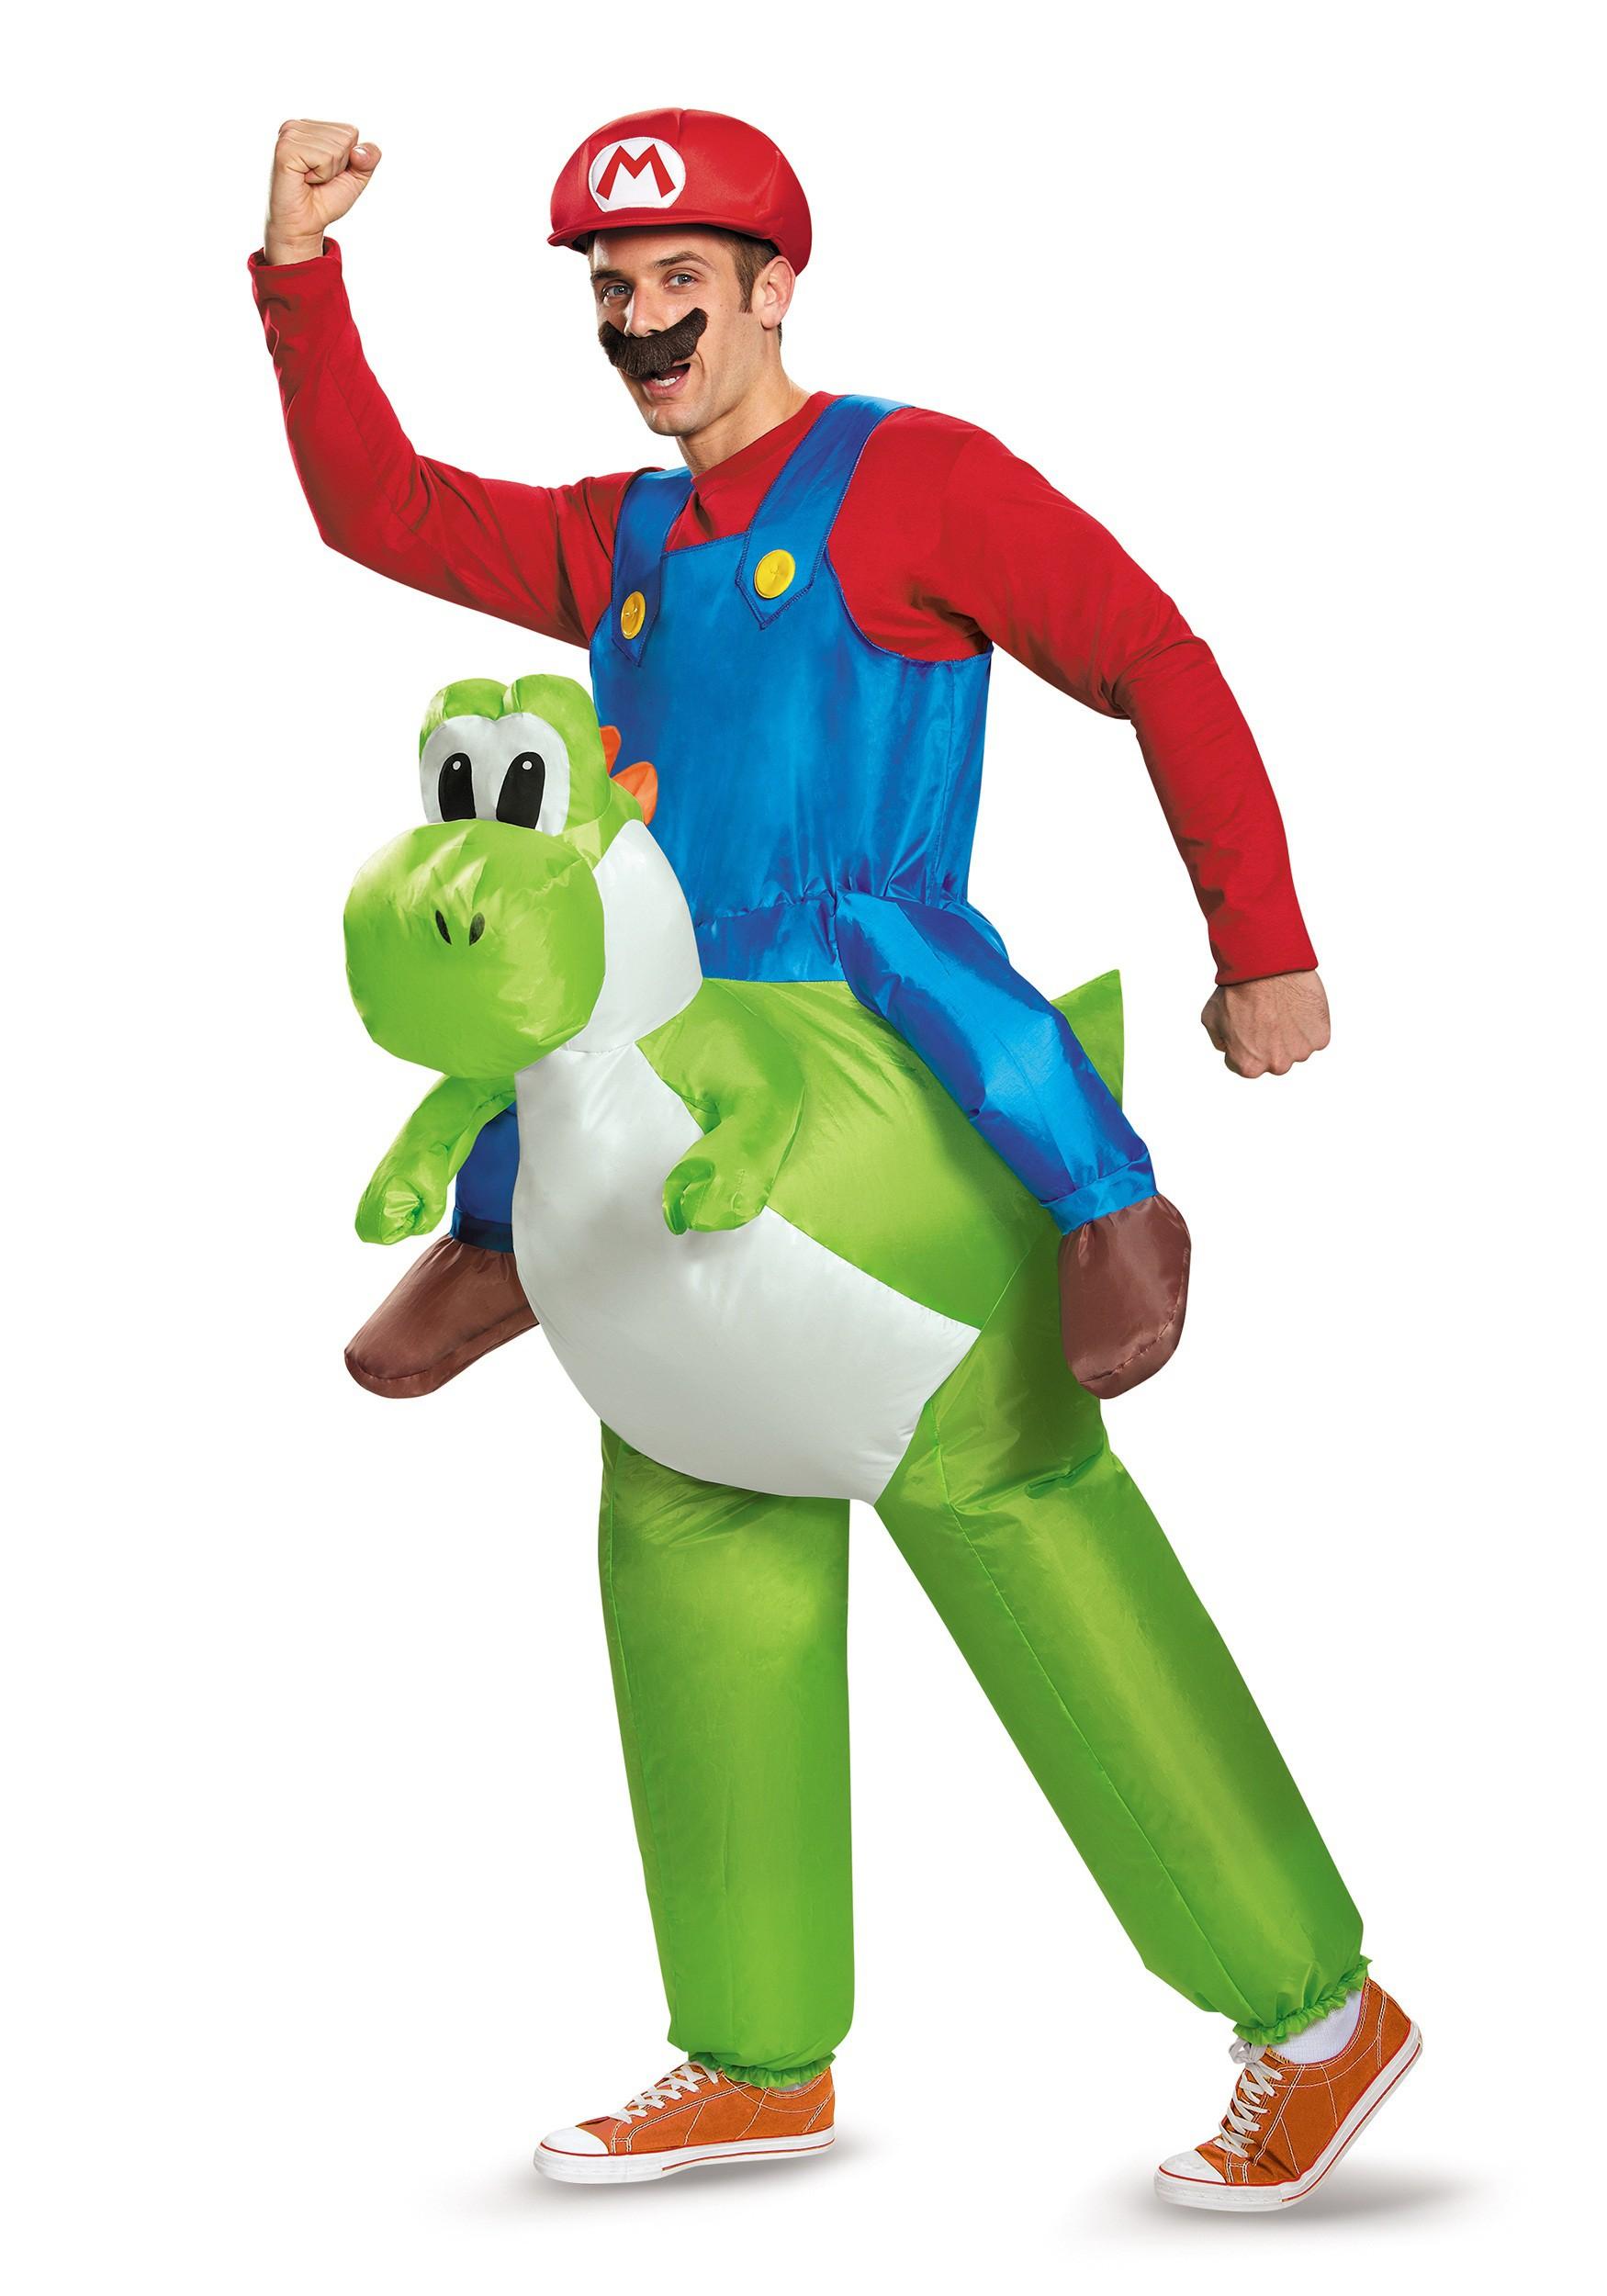 Mario Riding Yoshi Adult Costume  sc 1 st  Fun.com & Mario Riding Yoshi Costume for Adults